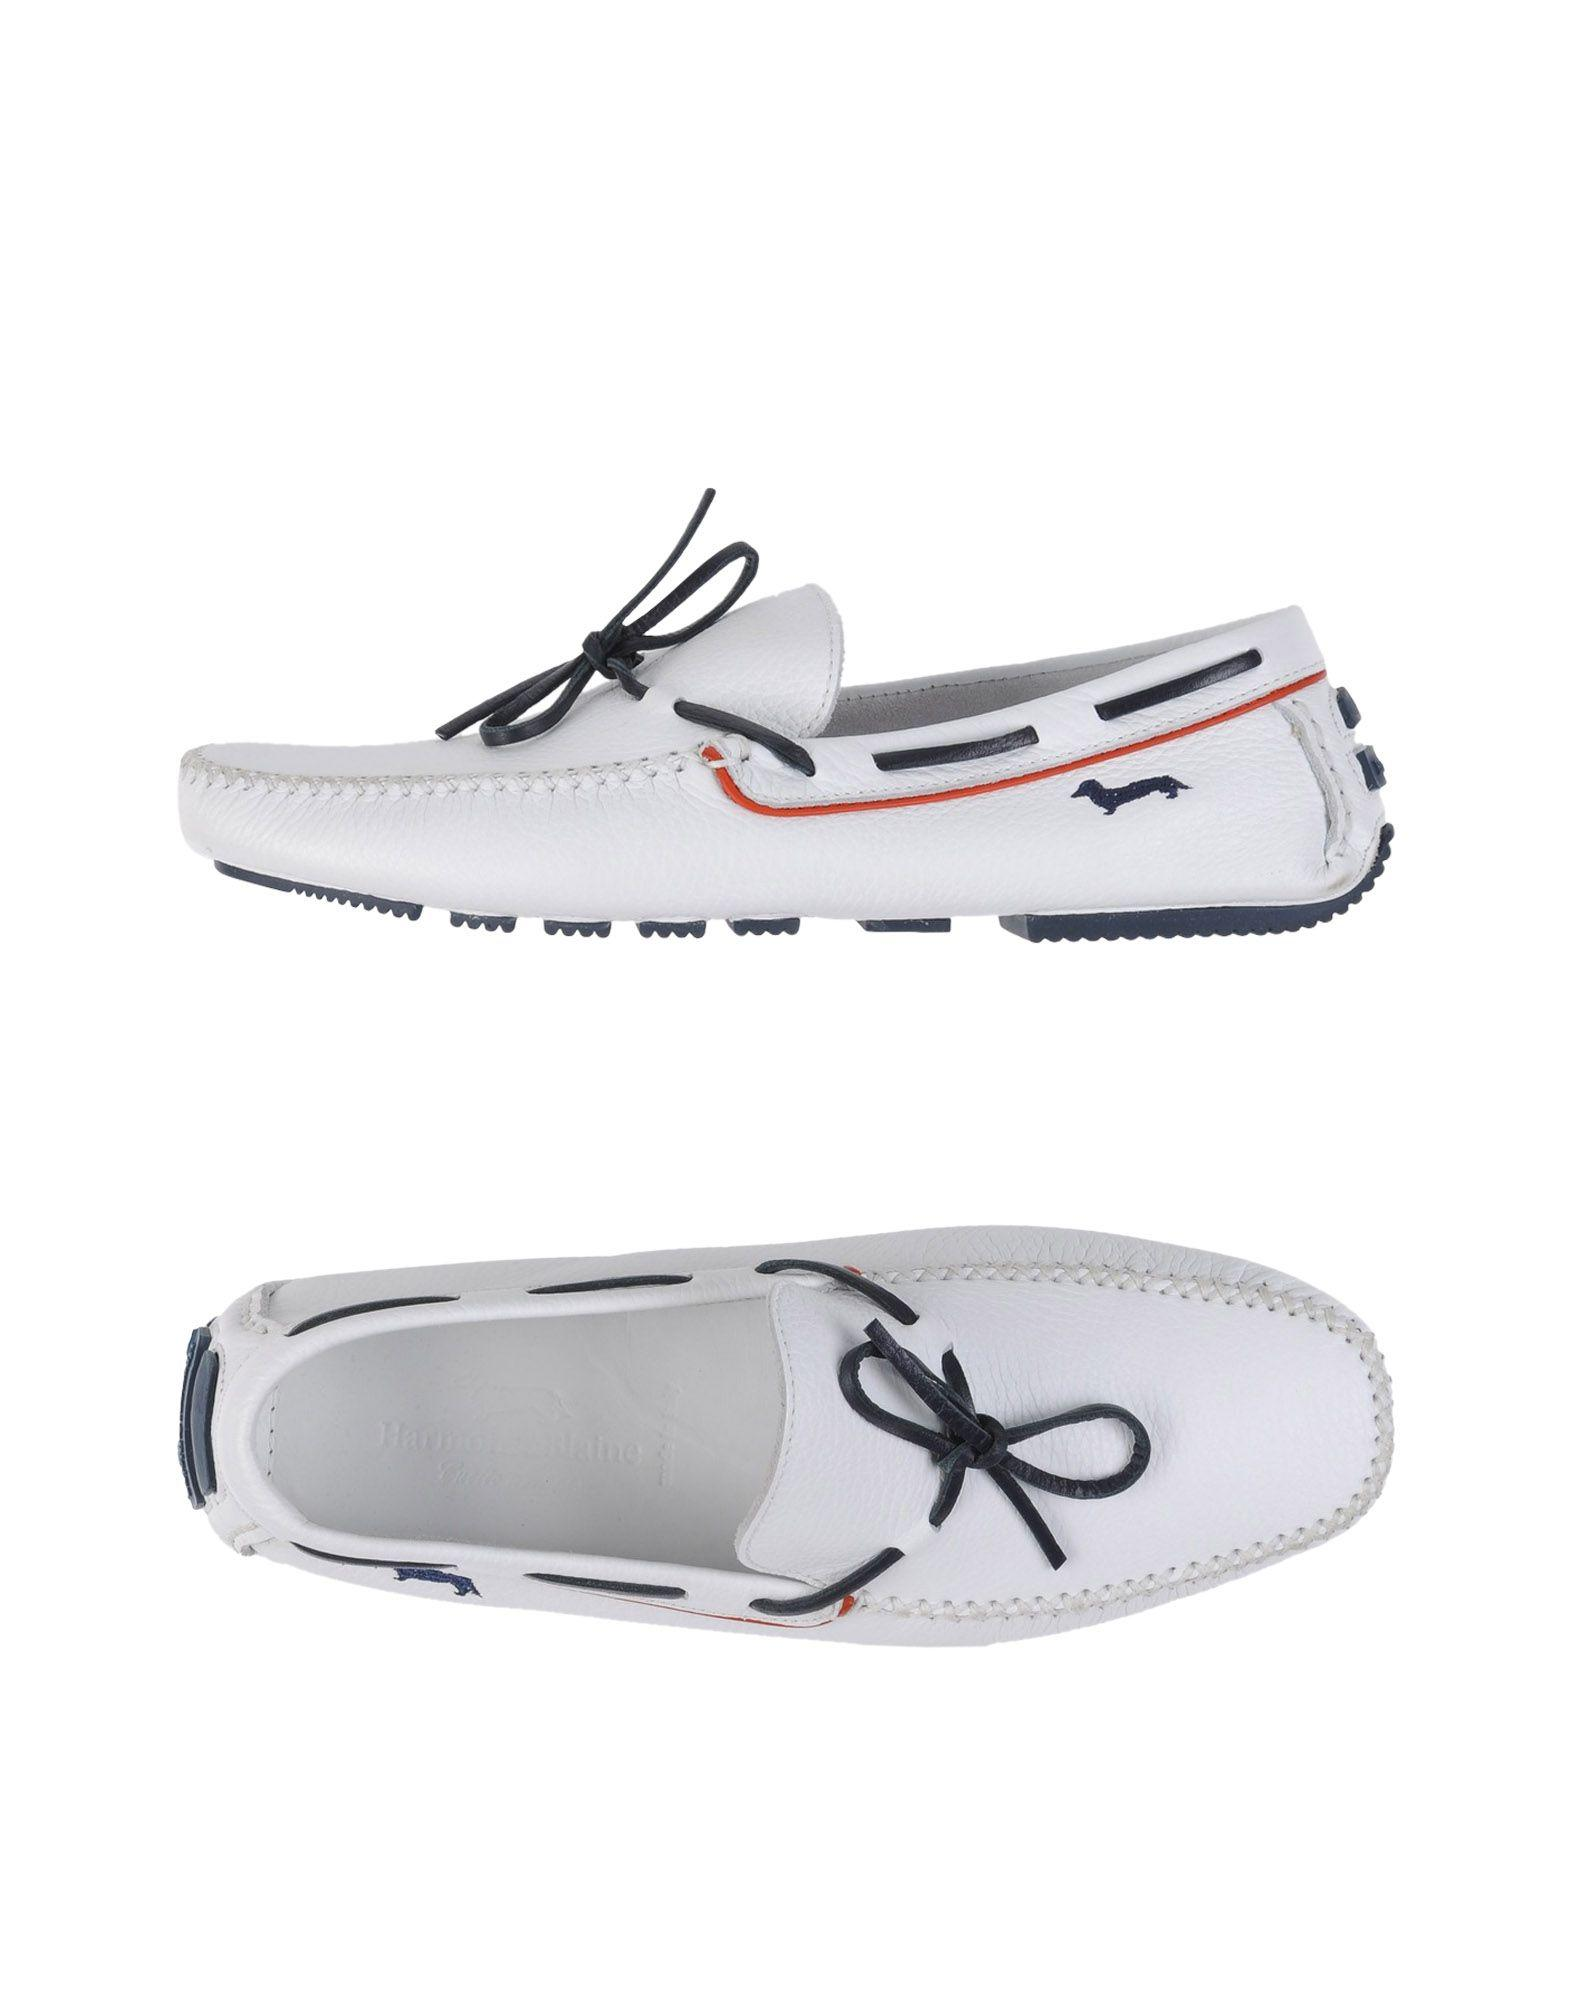 FOOTWEAR - Loafers Harmont & Blaine Y4YZIR